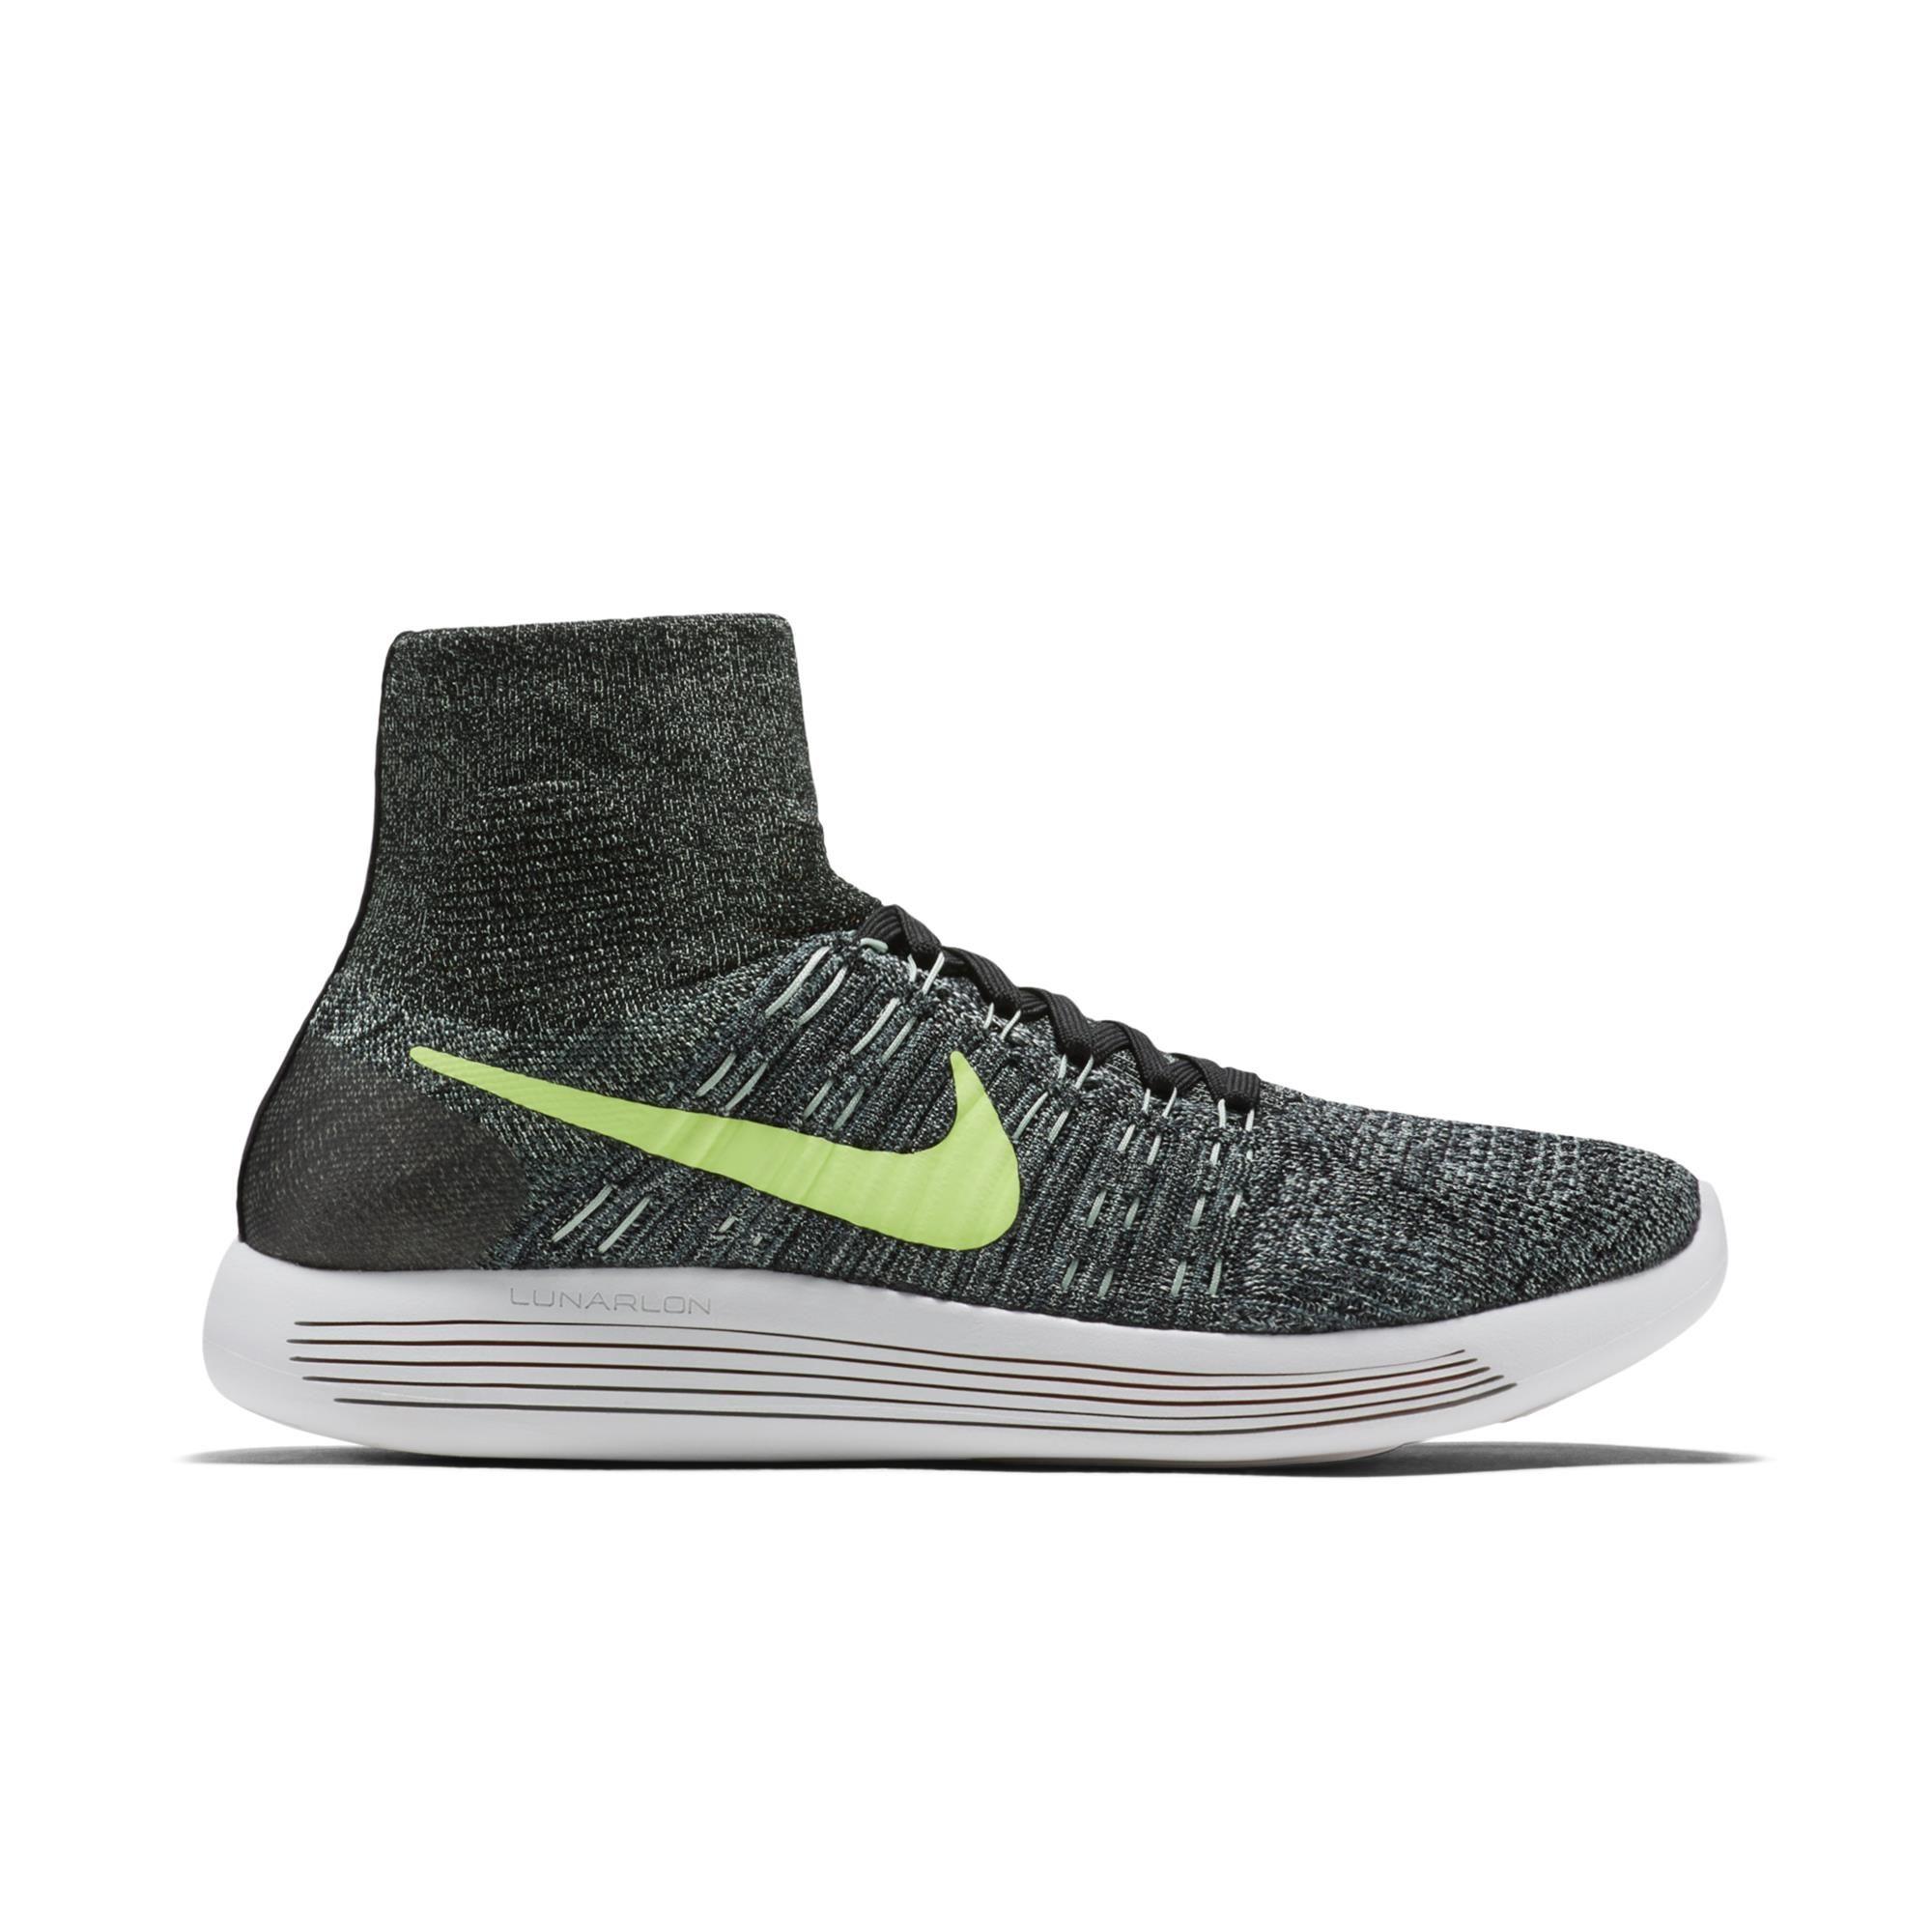 Converse Chuck Taylor All Star x Nike Flyknit (Dark Atomic Teal) | chks |  Pinterest | Nike flyknit, Converse chuck taylor and Converse chuck